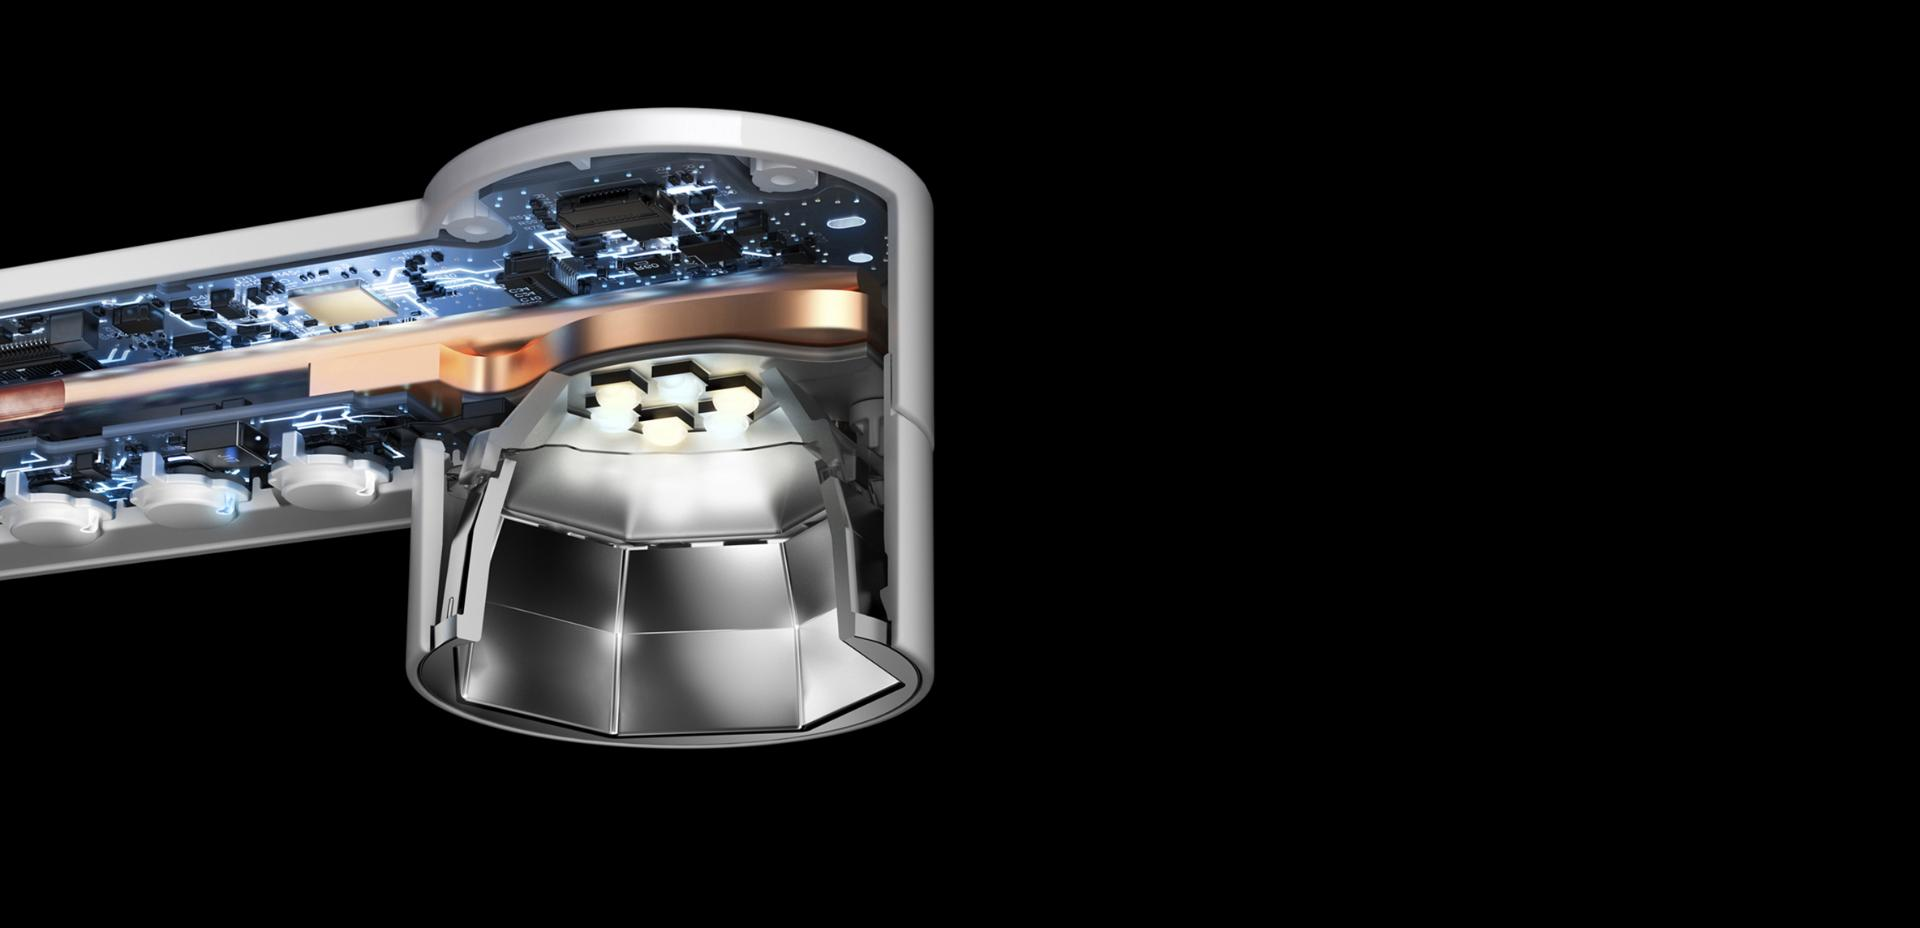 Inside the intelligent optical head